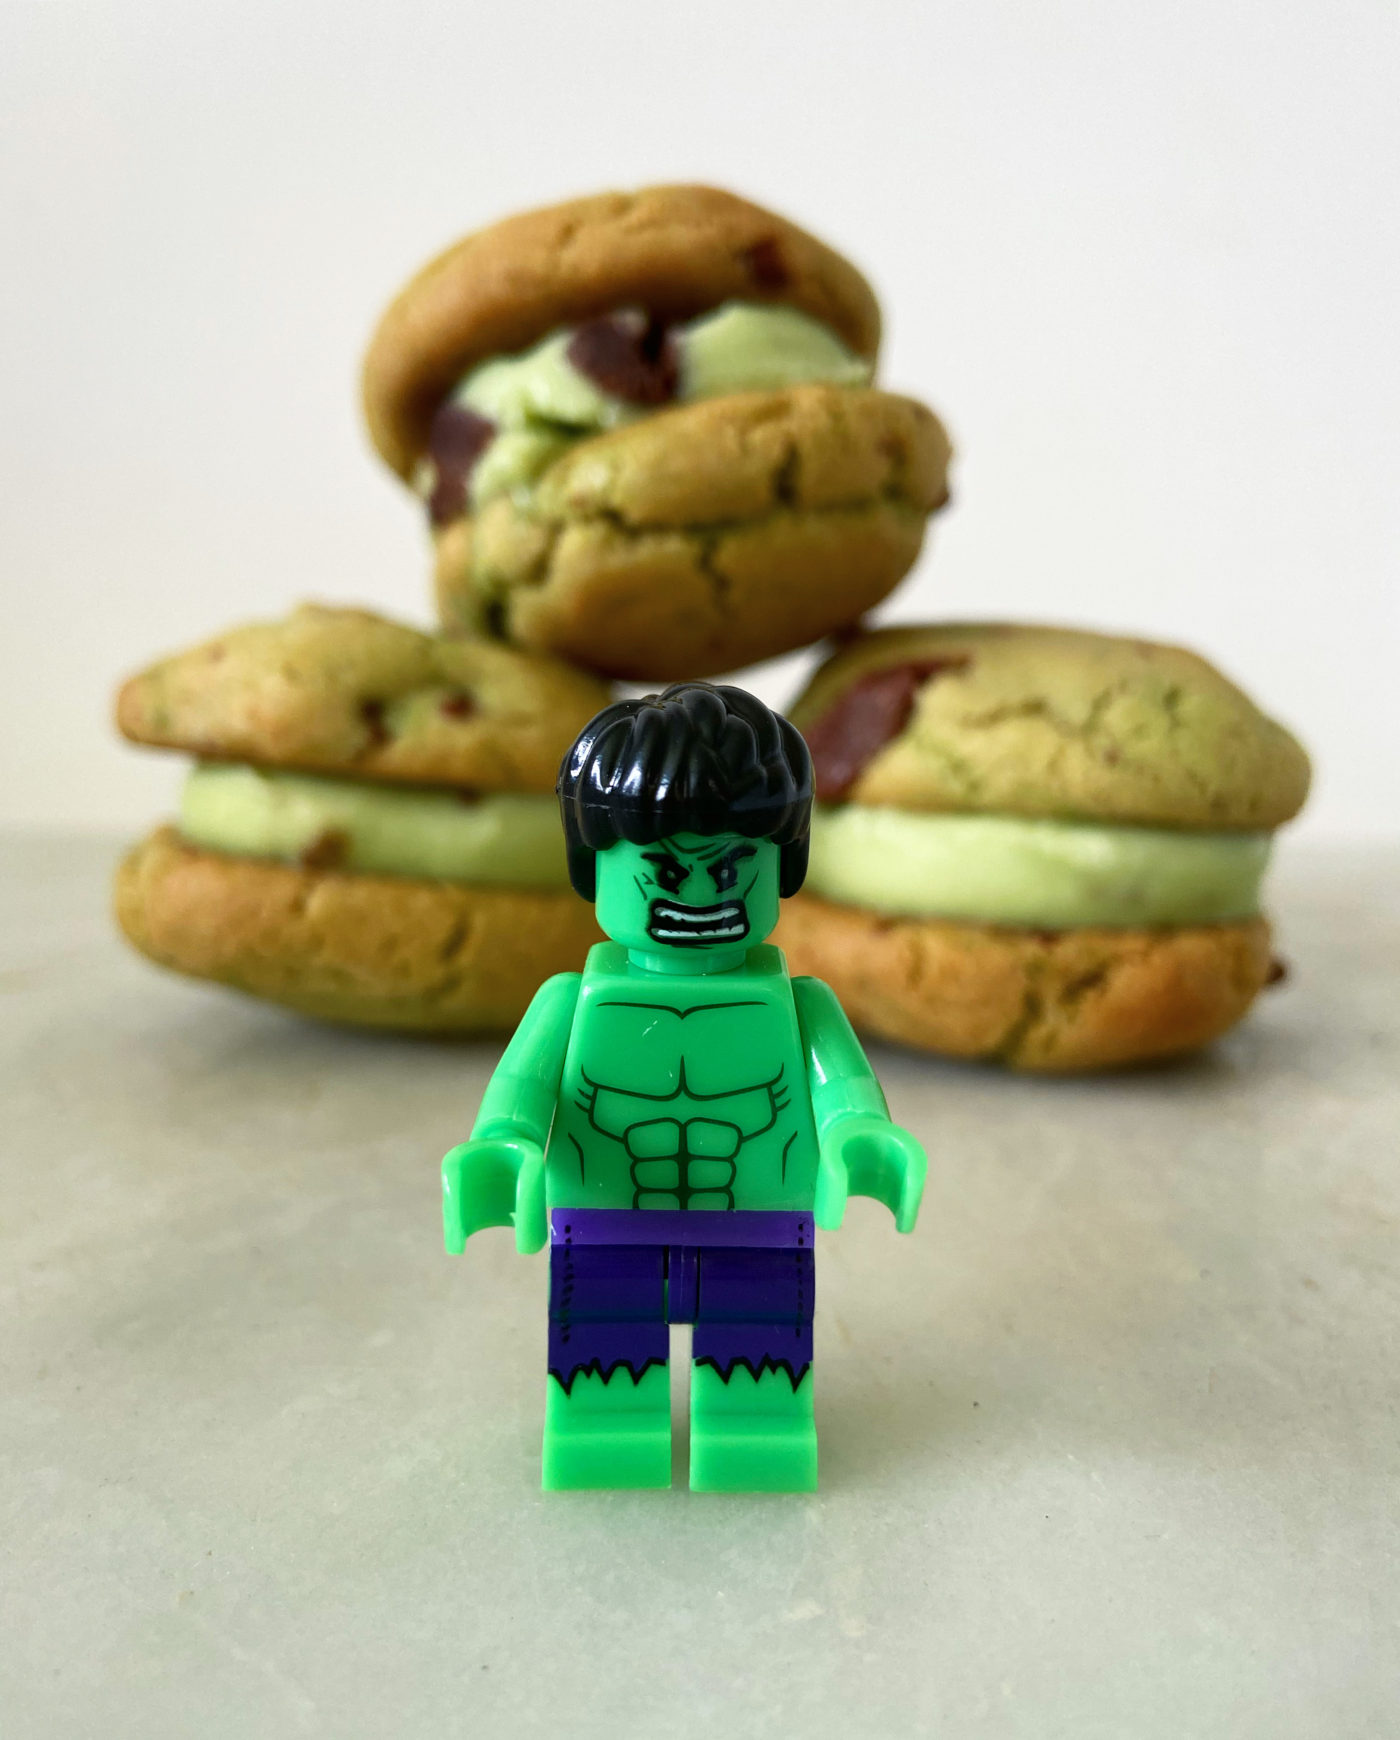 Hulk ice cream sandwiches